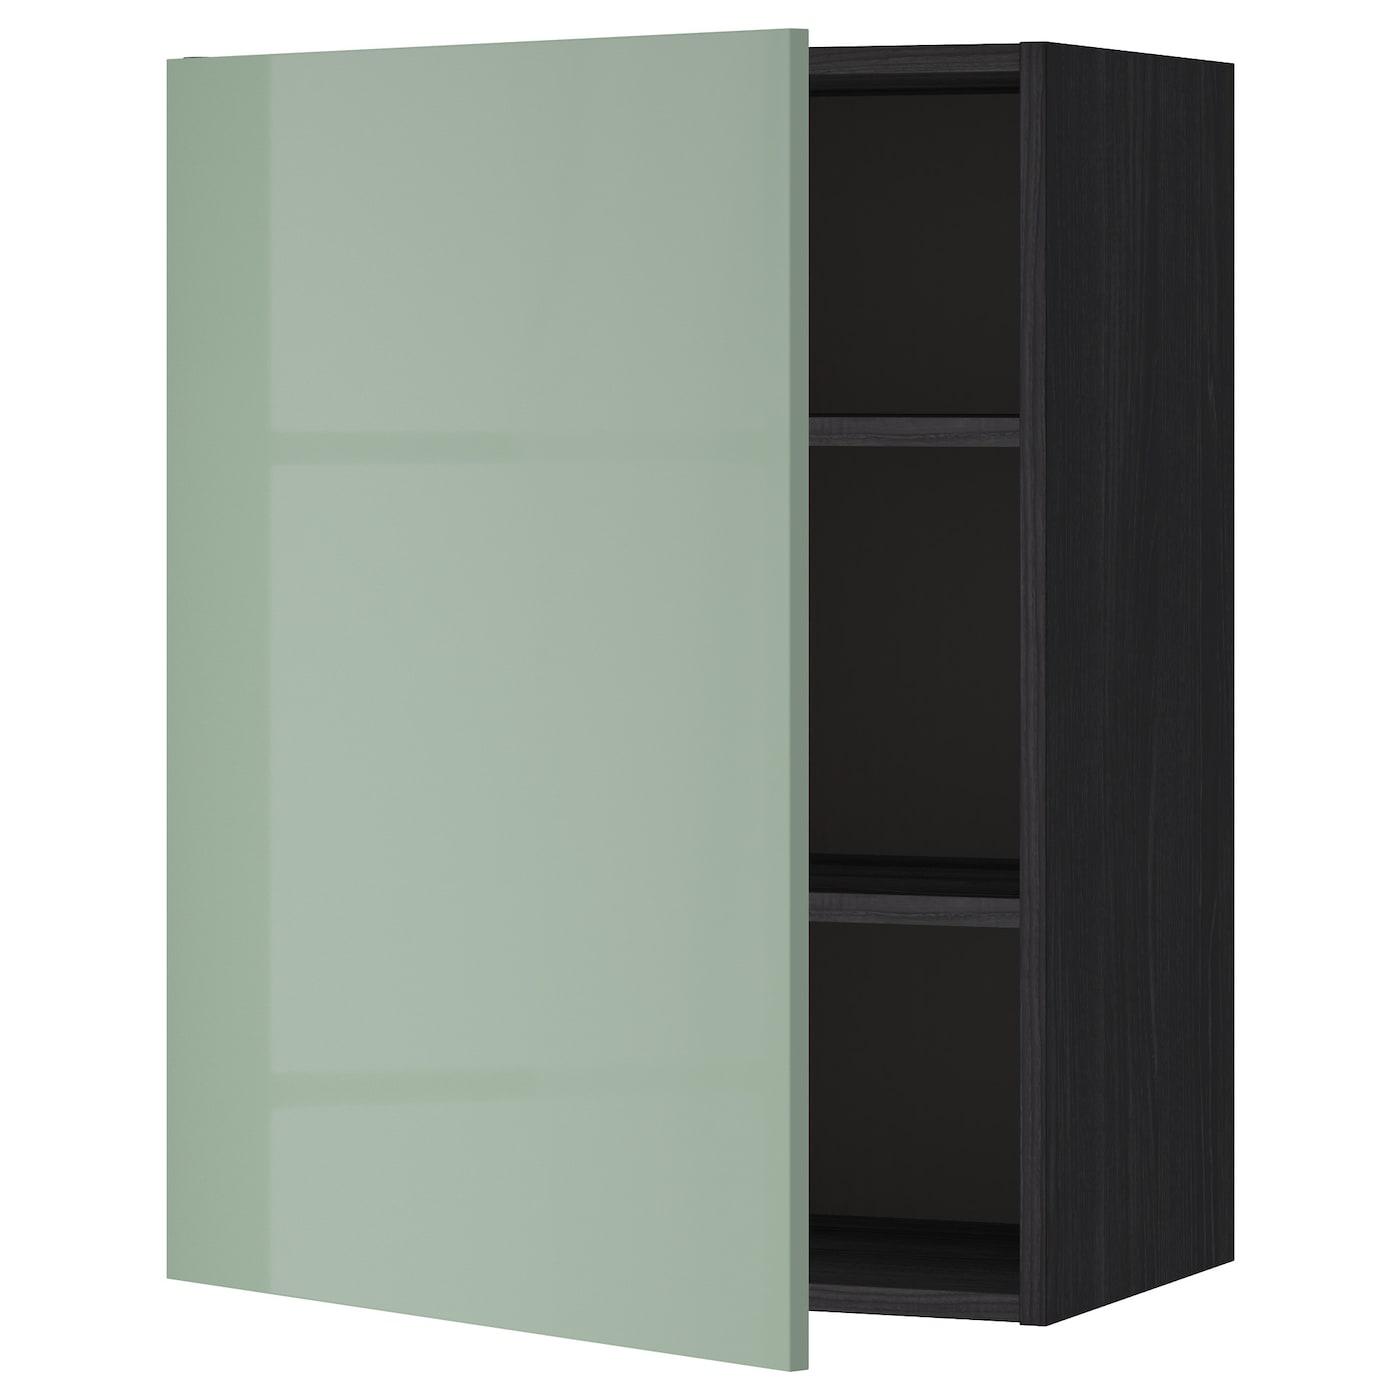 k chen h ngeschr nke online kaufen m bel suchmaschine. Black Bedroom Furniture Sets. Home Design Ideas